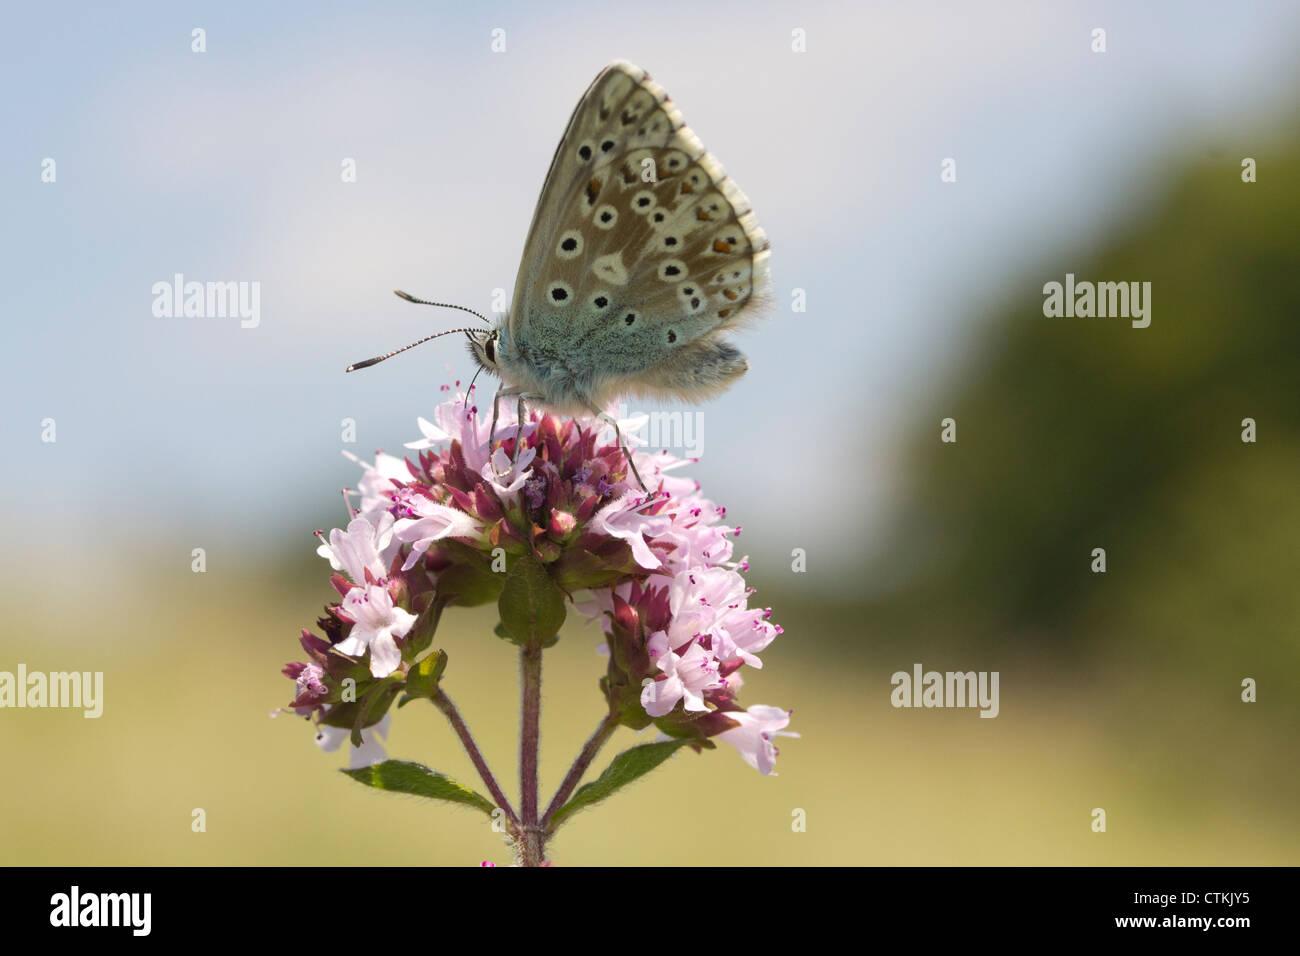 Chalkhill blue butterfly (Lysandra coridon) on marjoram. Surrey, UK. - Stock Image